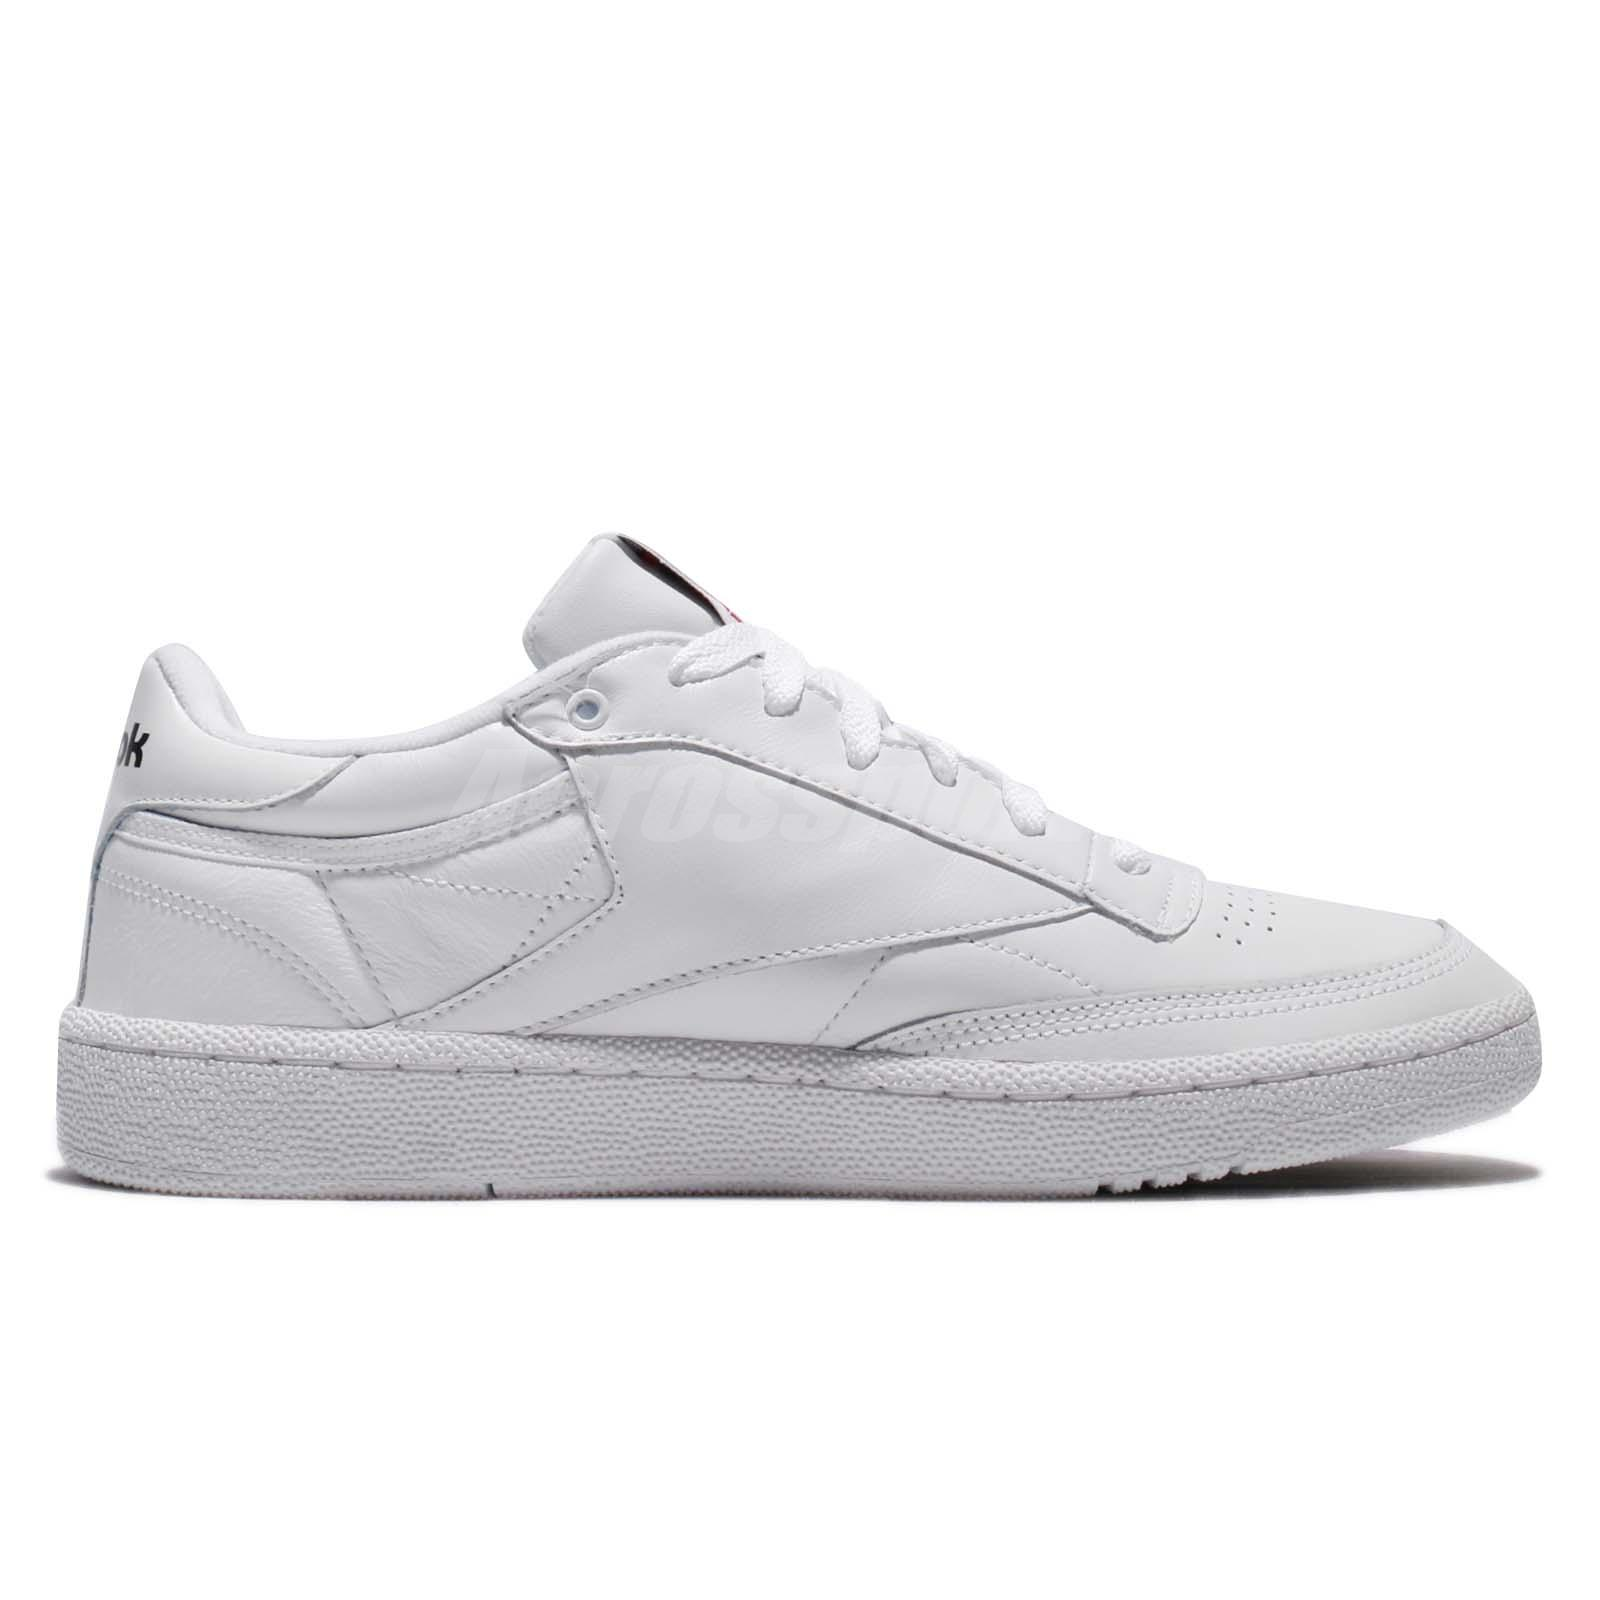 9ea8e31e3cc3b Reebok Club C 85 Pro Leather White Classic Men Shoes Sneakers Trainers  CM9430